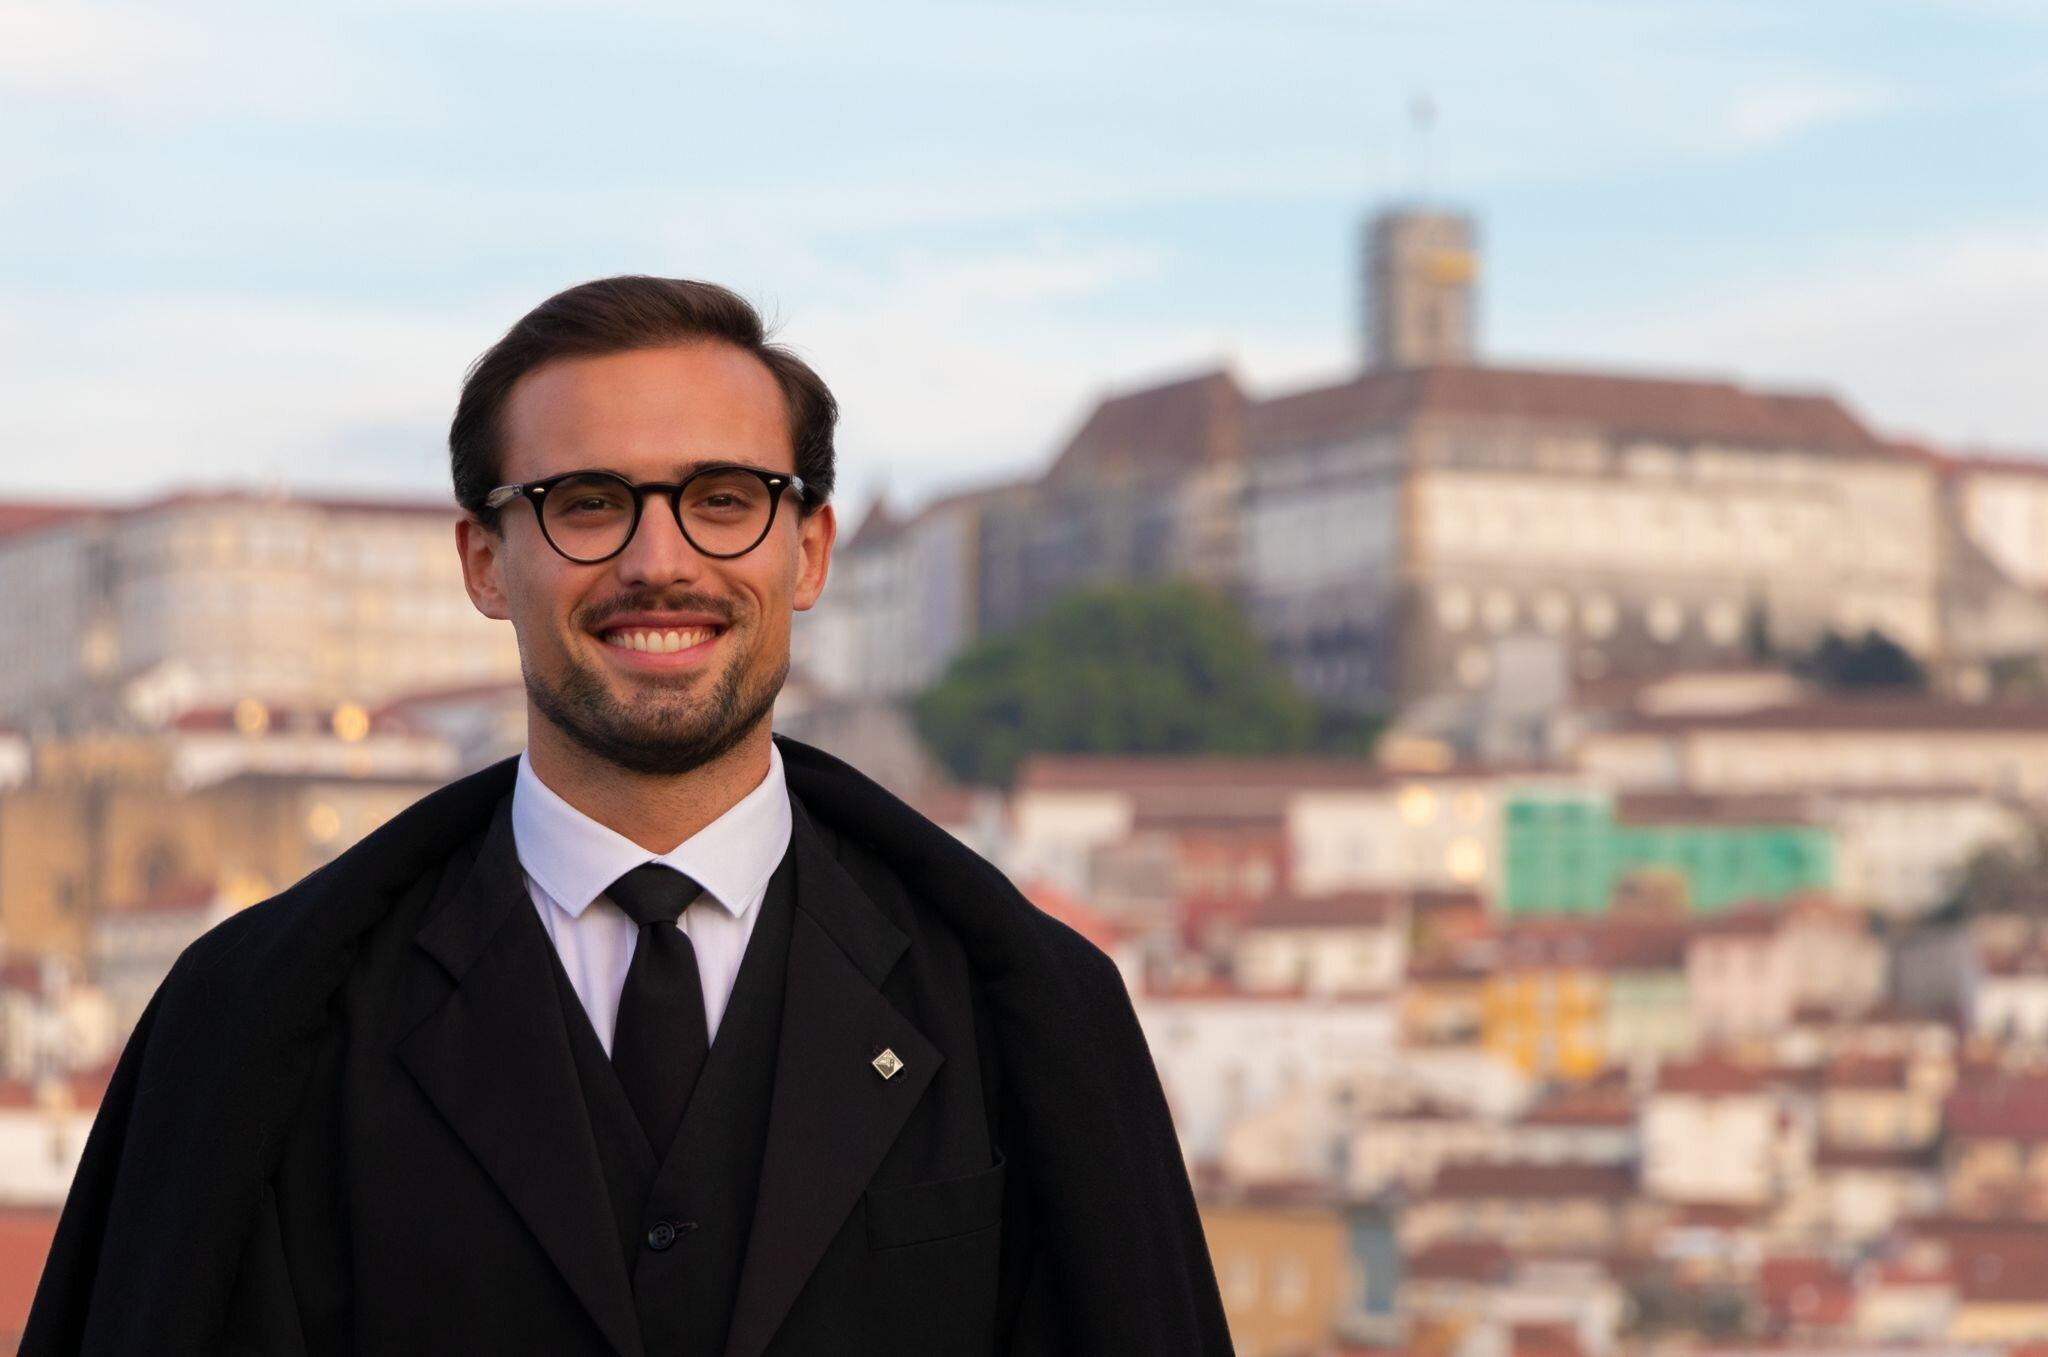 Pedro Marques Dias